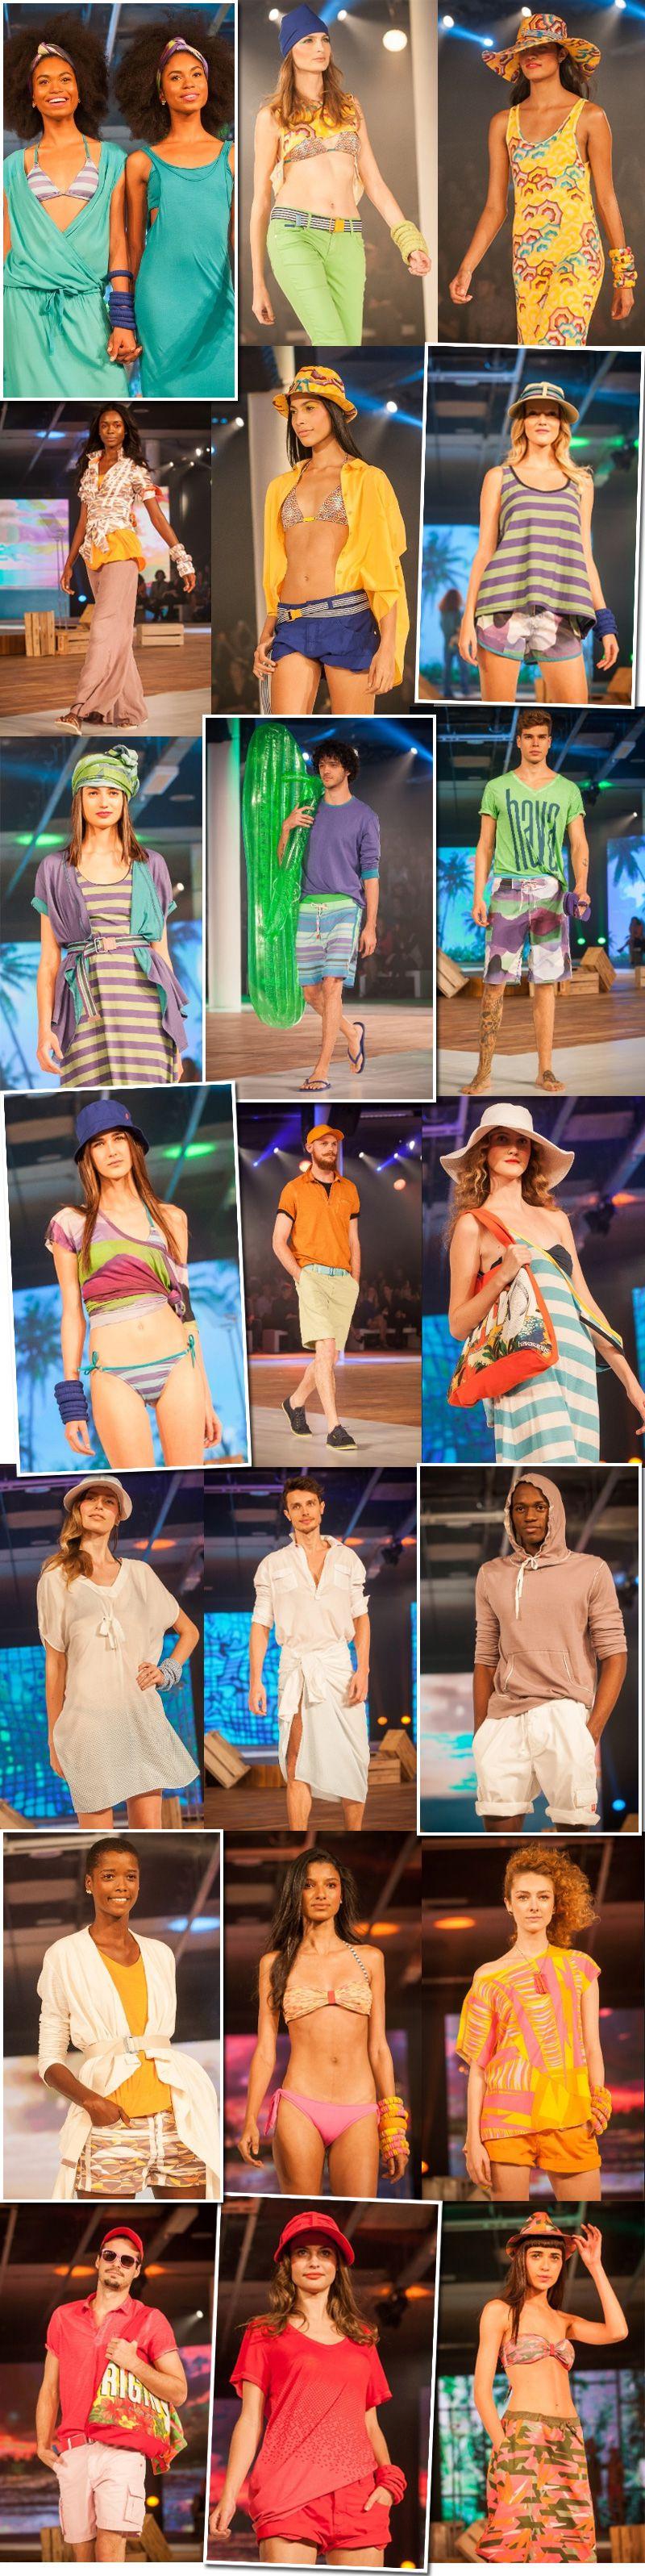 desfile-havaianas-roupas2